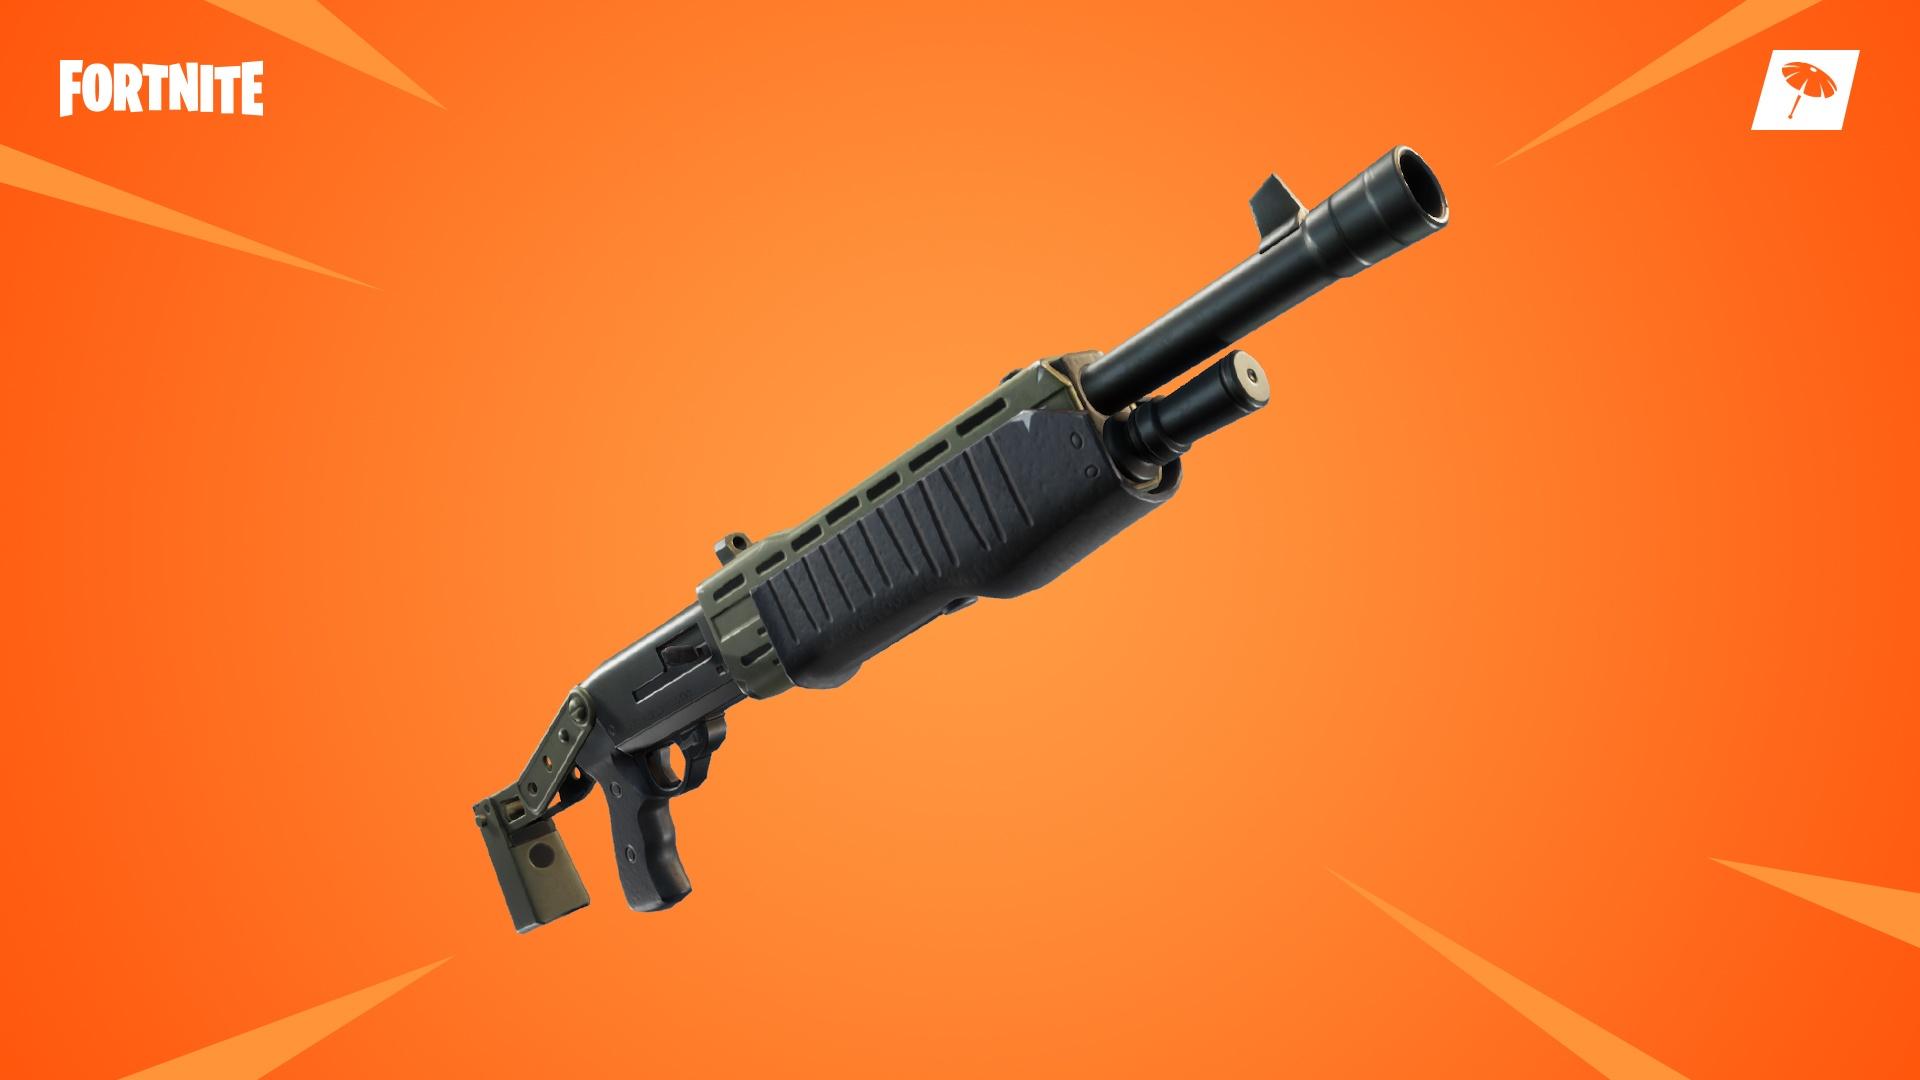 Fortnite Alle Waffen